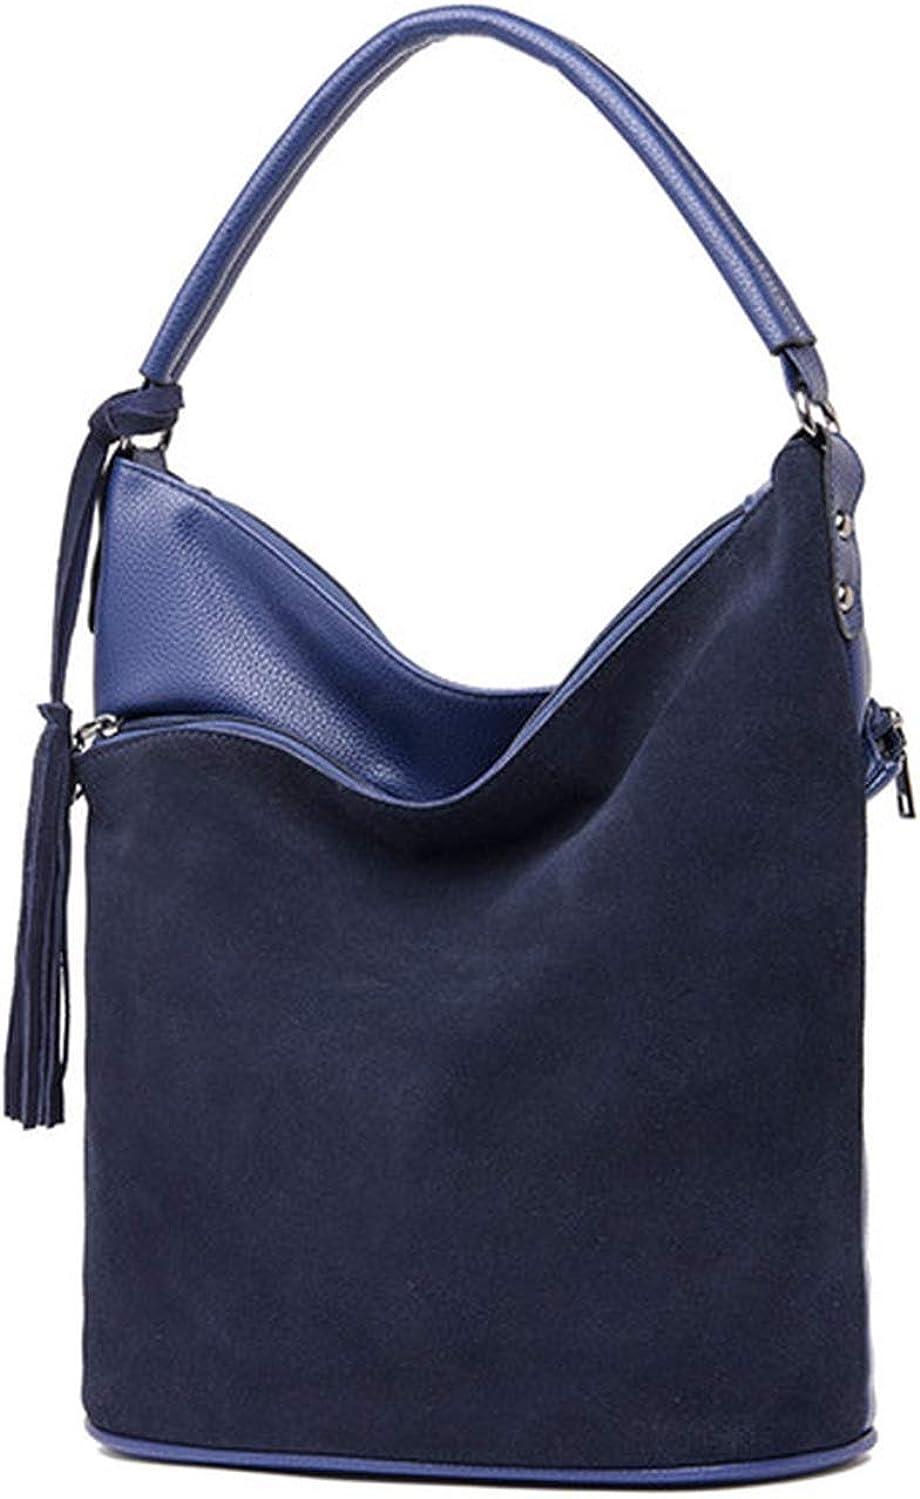 Leather Women Handbags...